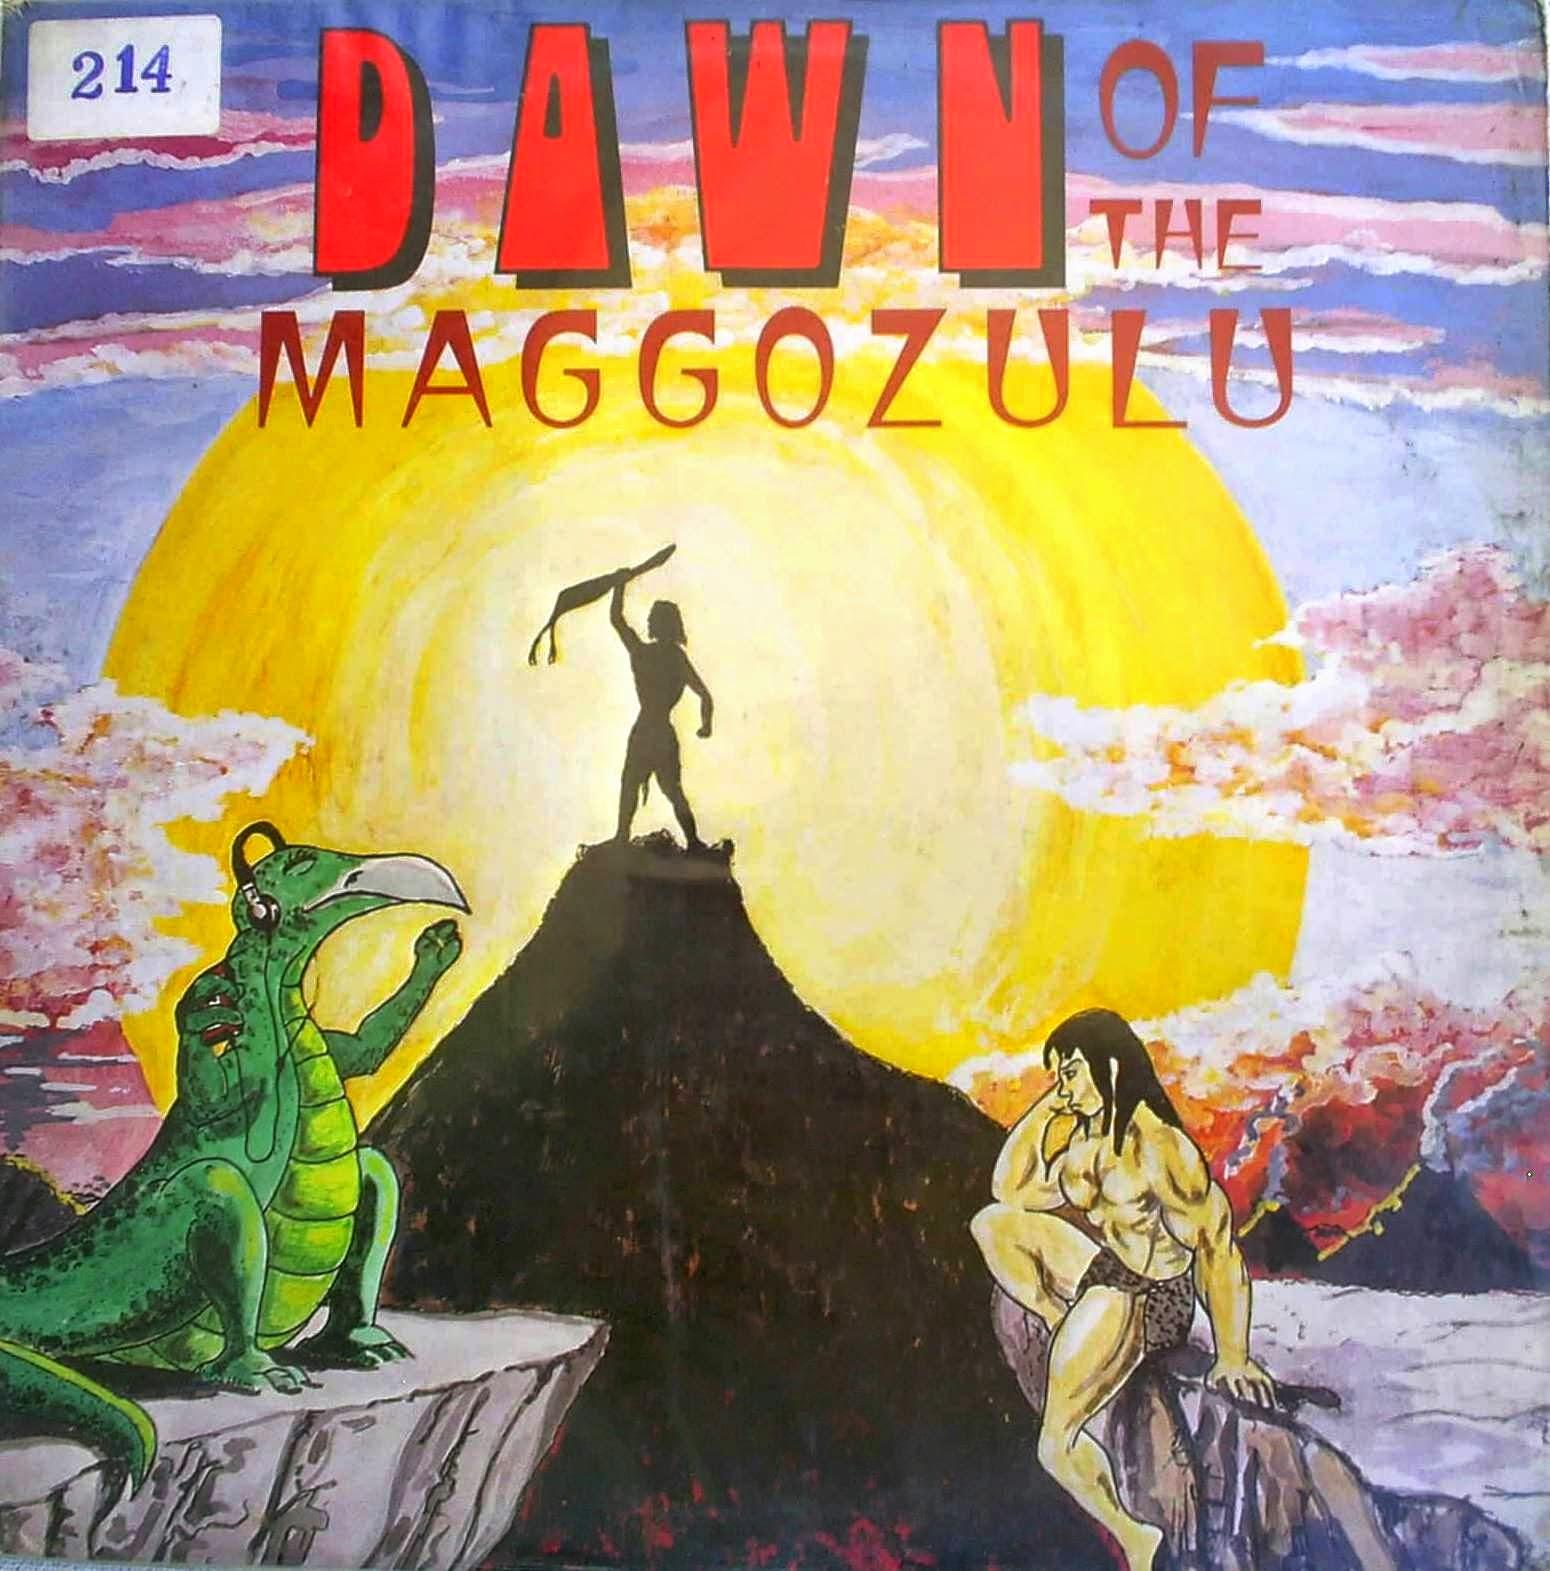 Maggozulu Too - Mix It Baby